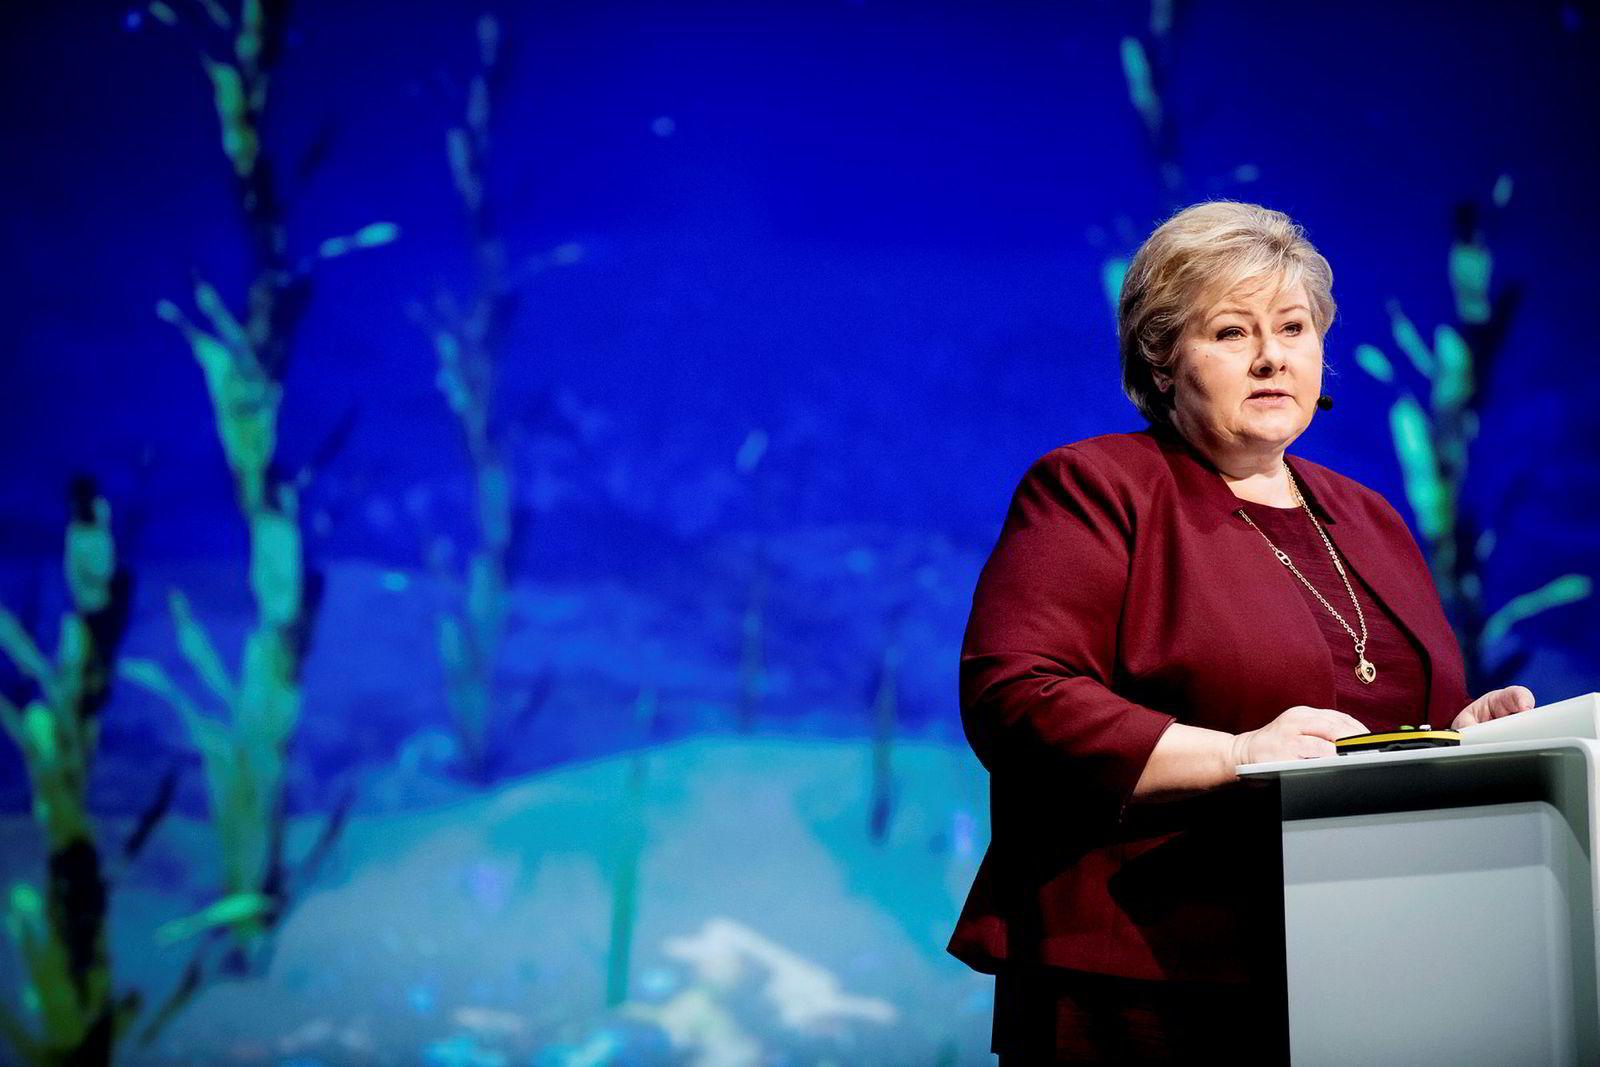 Statsminister Erna Solberg åpnet DNs Hav-konferanser på operaen i Oslo.